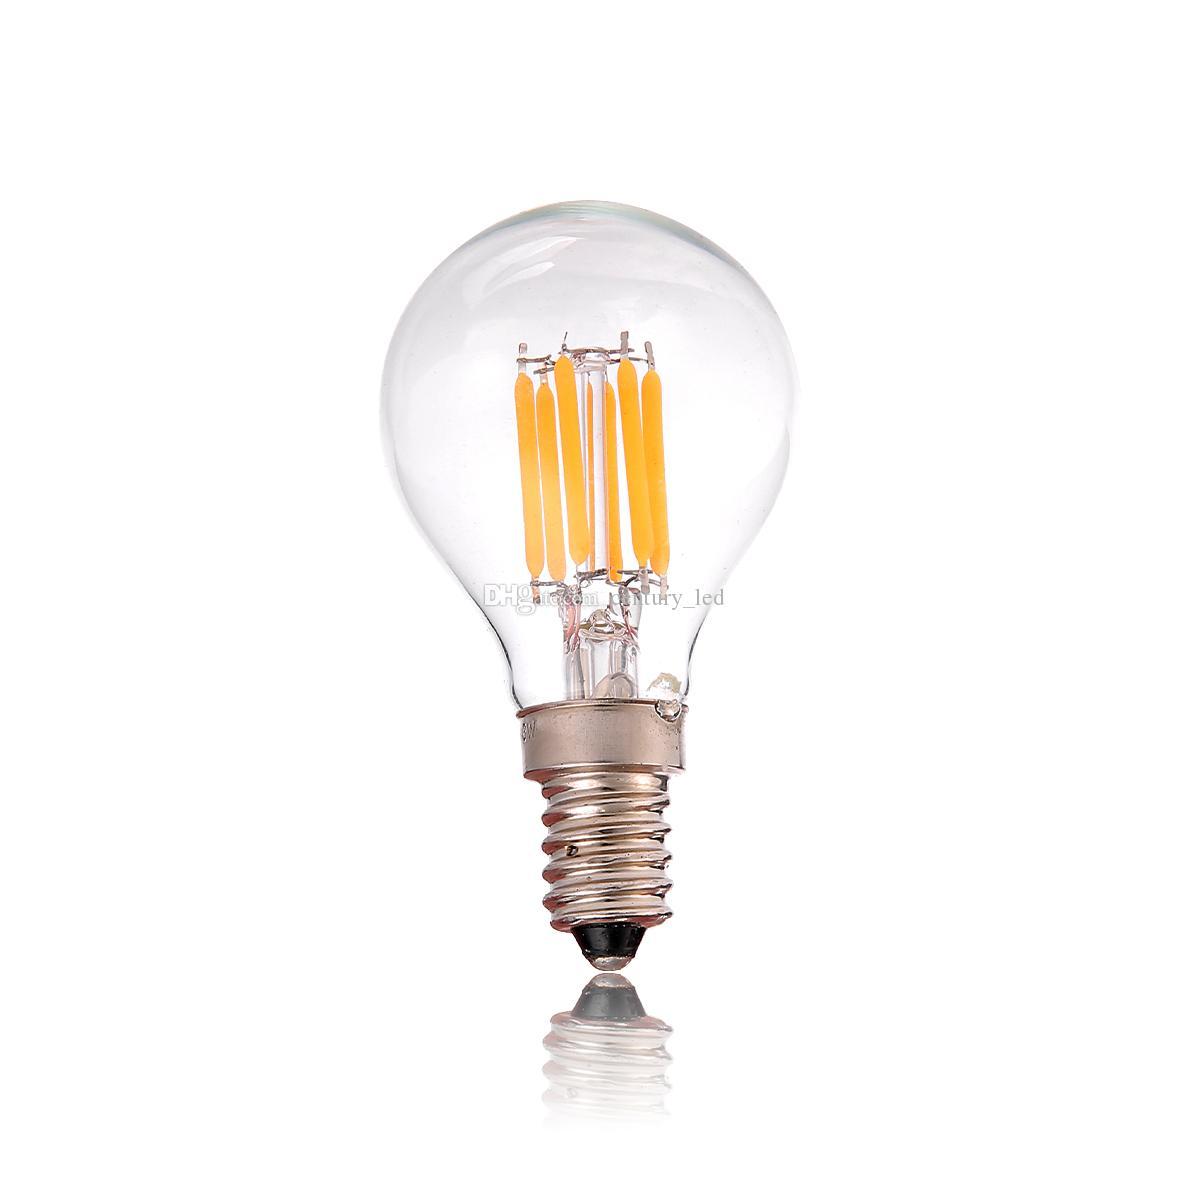 retro led filament bulb 3w edison g40 globe clear style warm white e12 e14 base dimmbale 100w. Black Bedroom Furniture Sets. Home Design Ideas